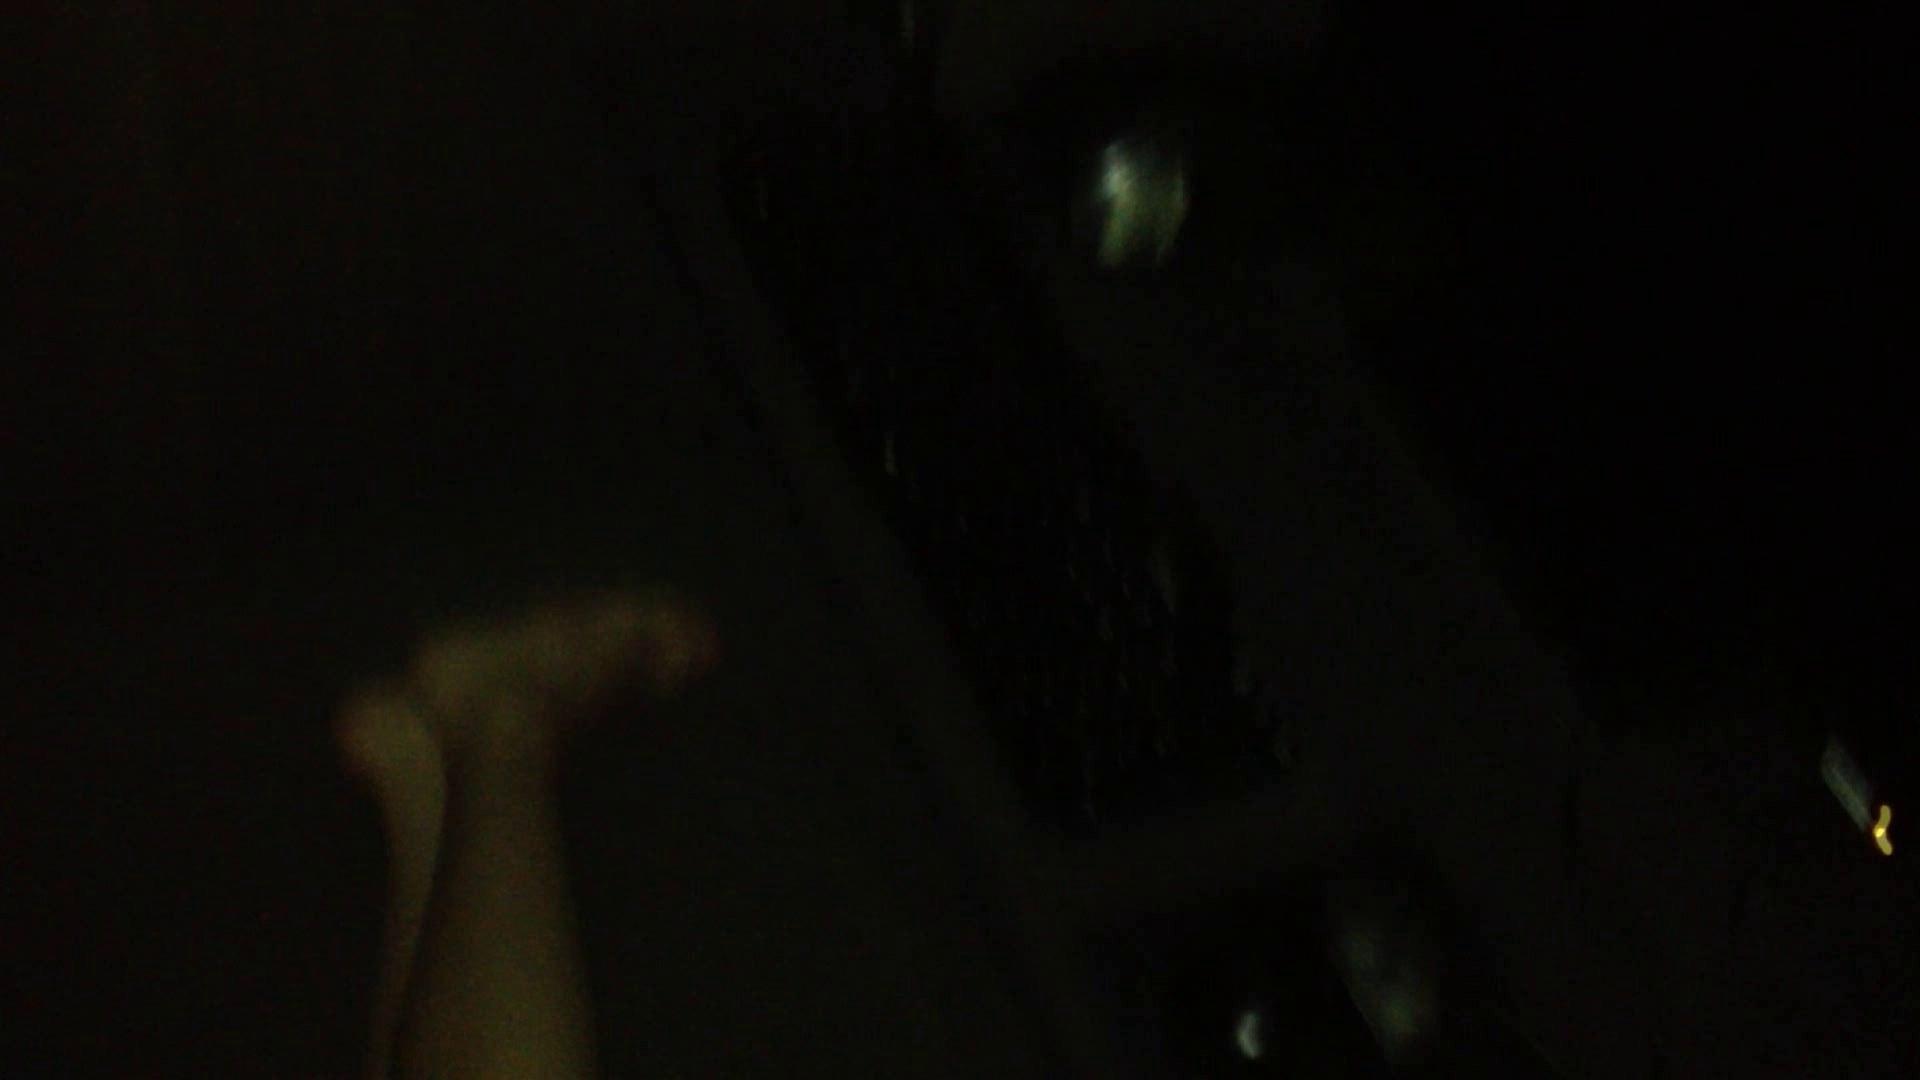 vol.45 【YMちゃん】現役JD純白パンツのお嬢様 チラ見 ワレメ動画紹介 104枚 26